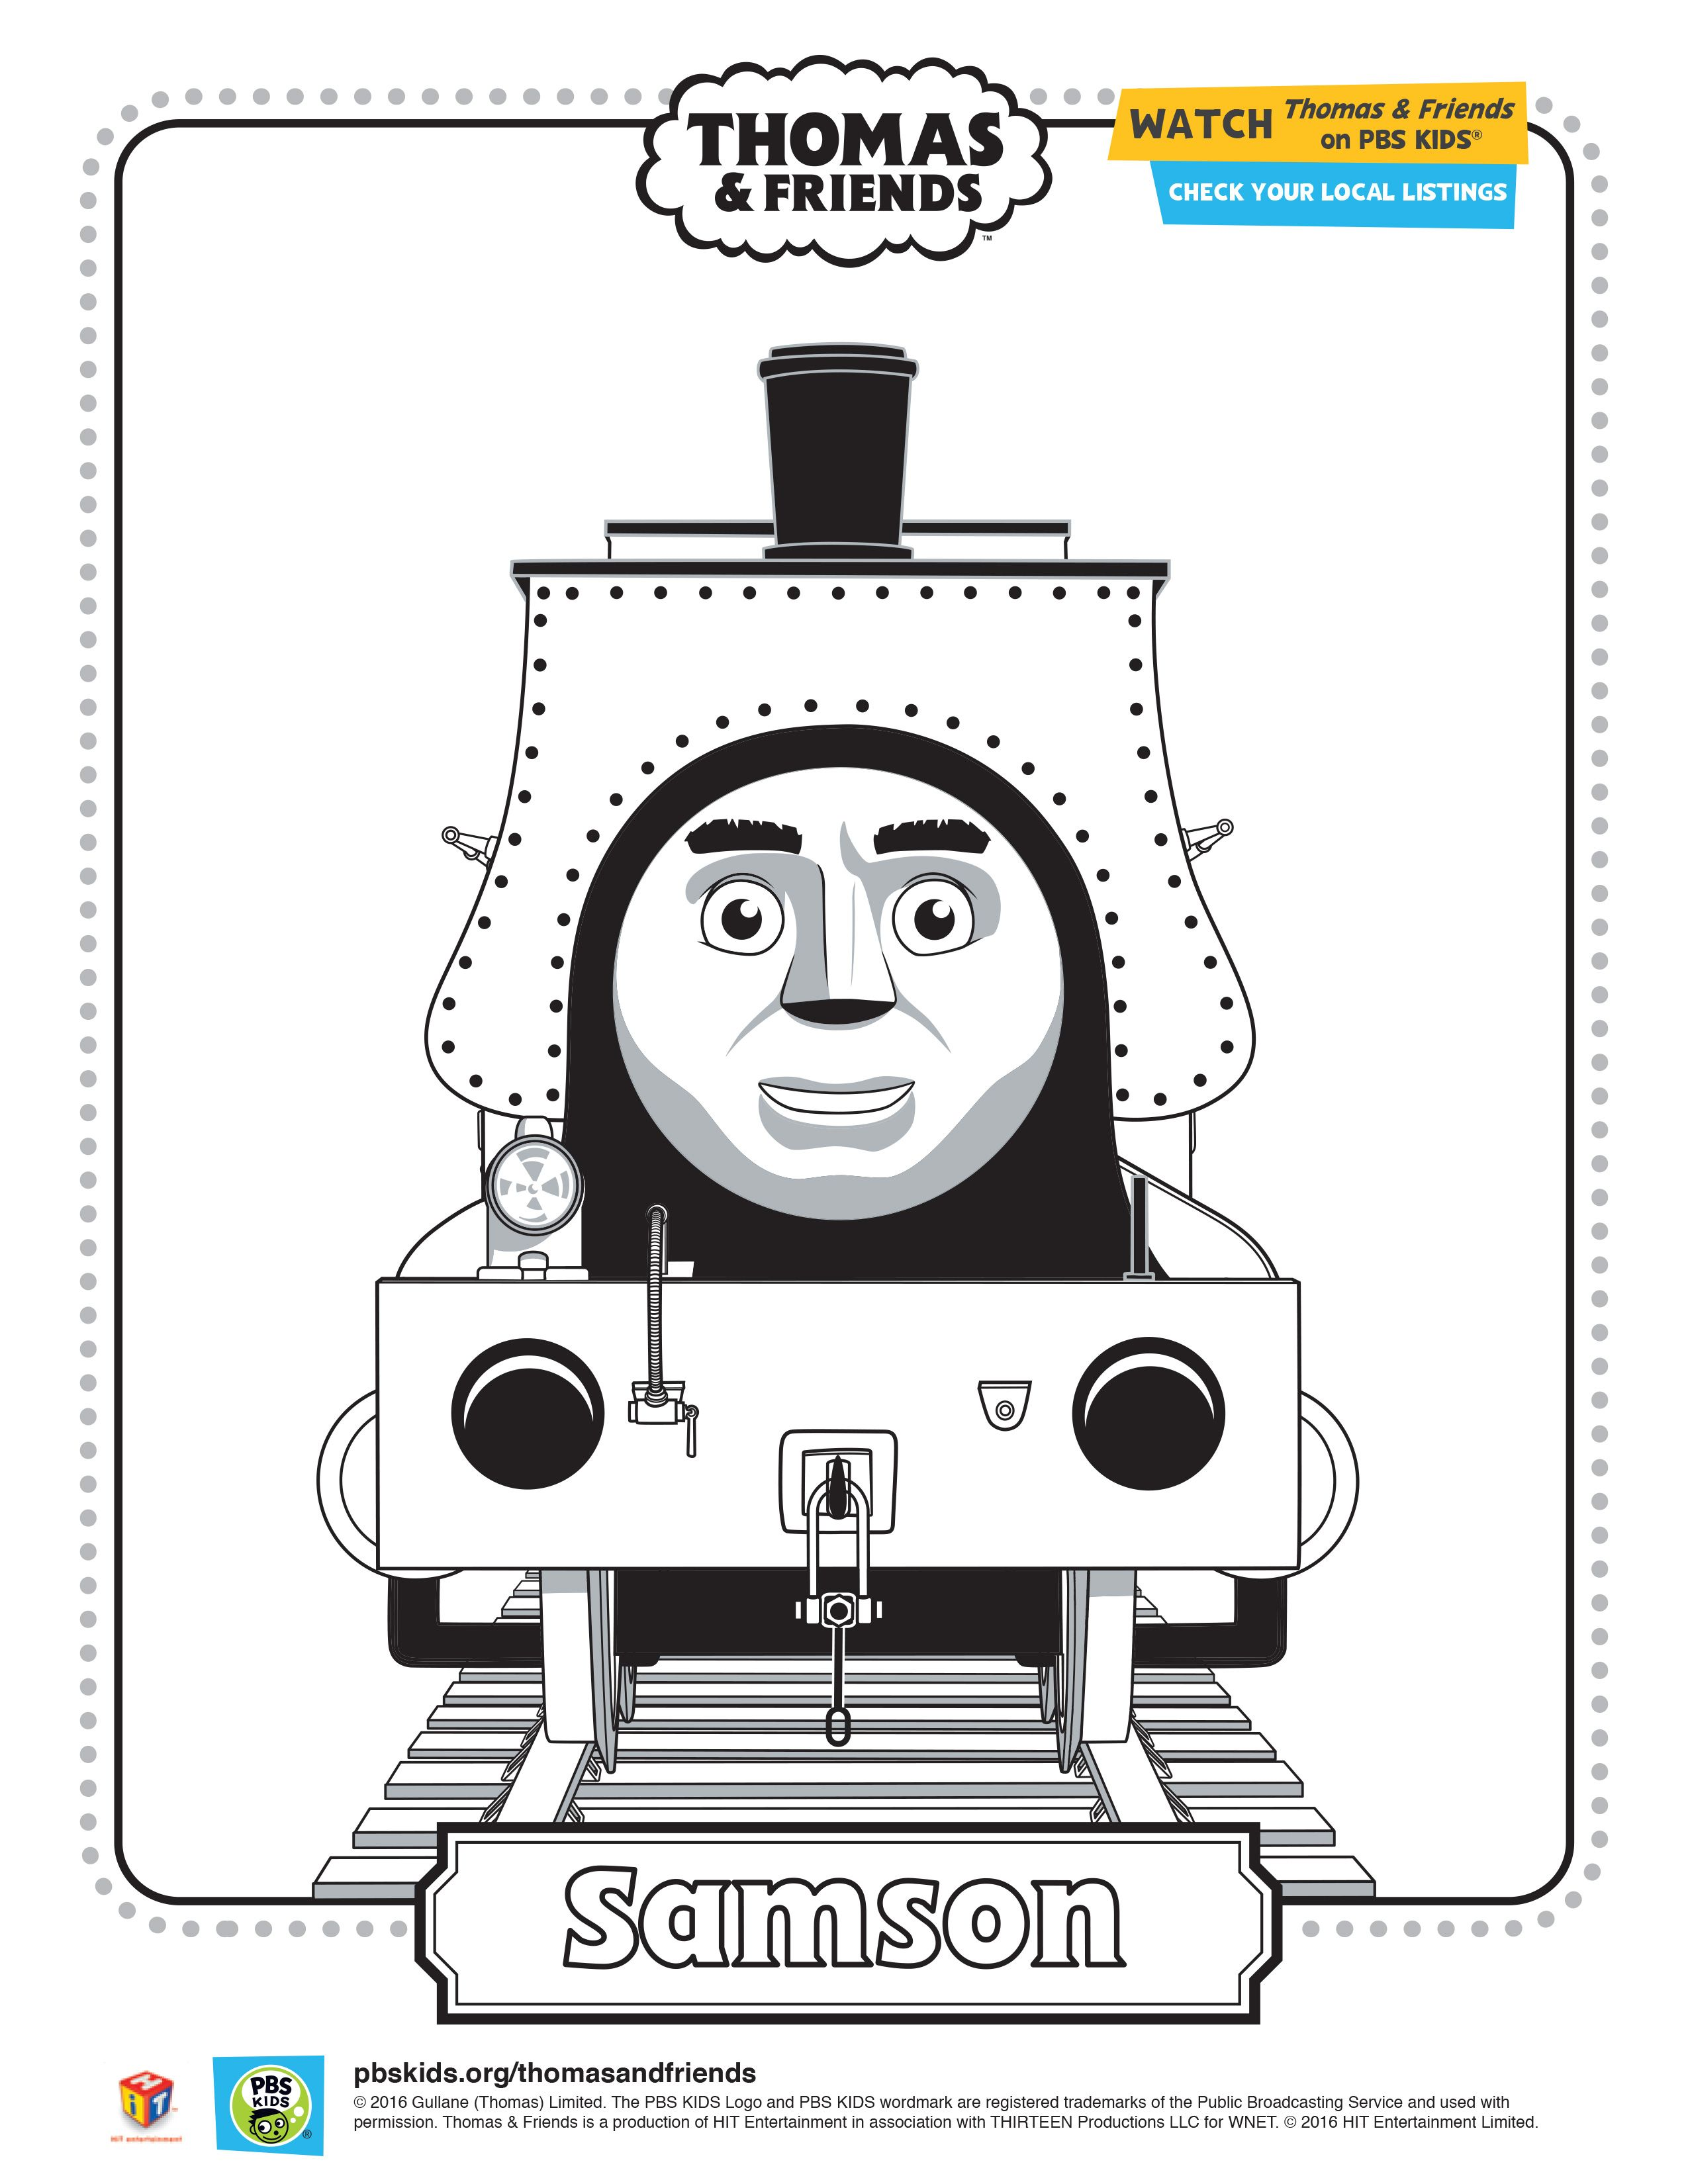 Samson Coloring Sheet Thomasandfriends Pbskids Printable Coloringpage